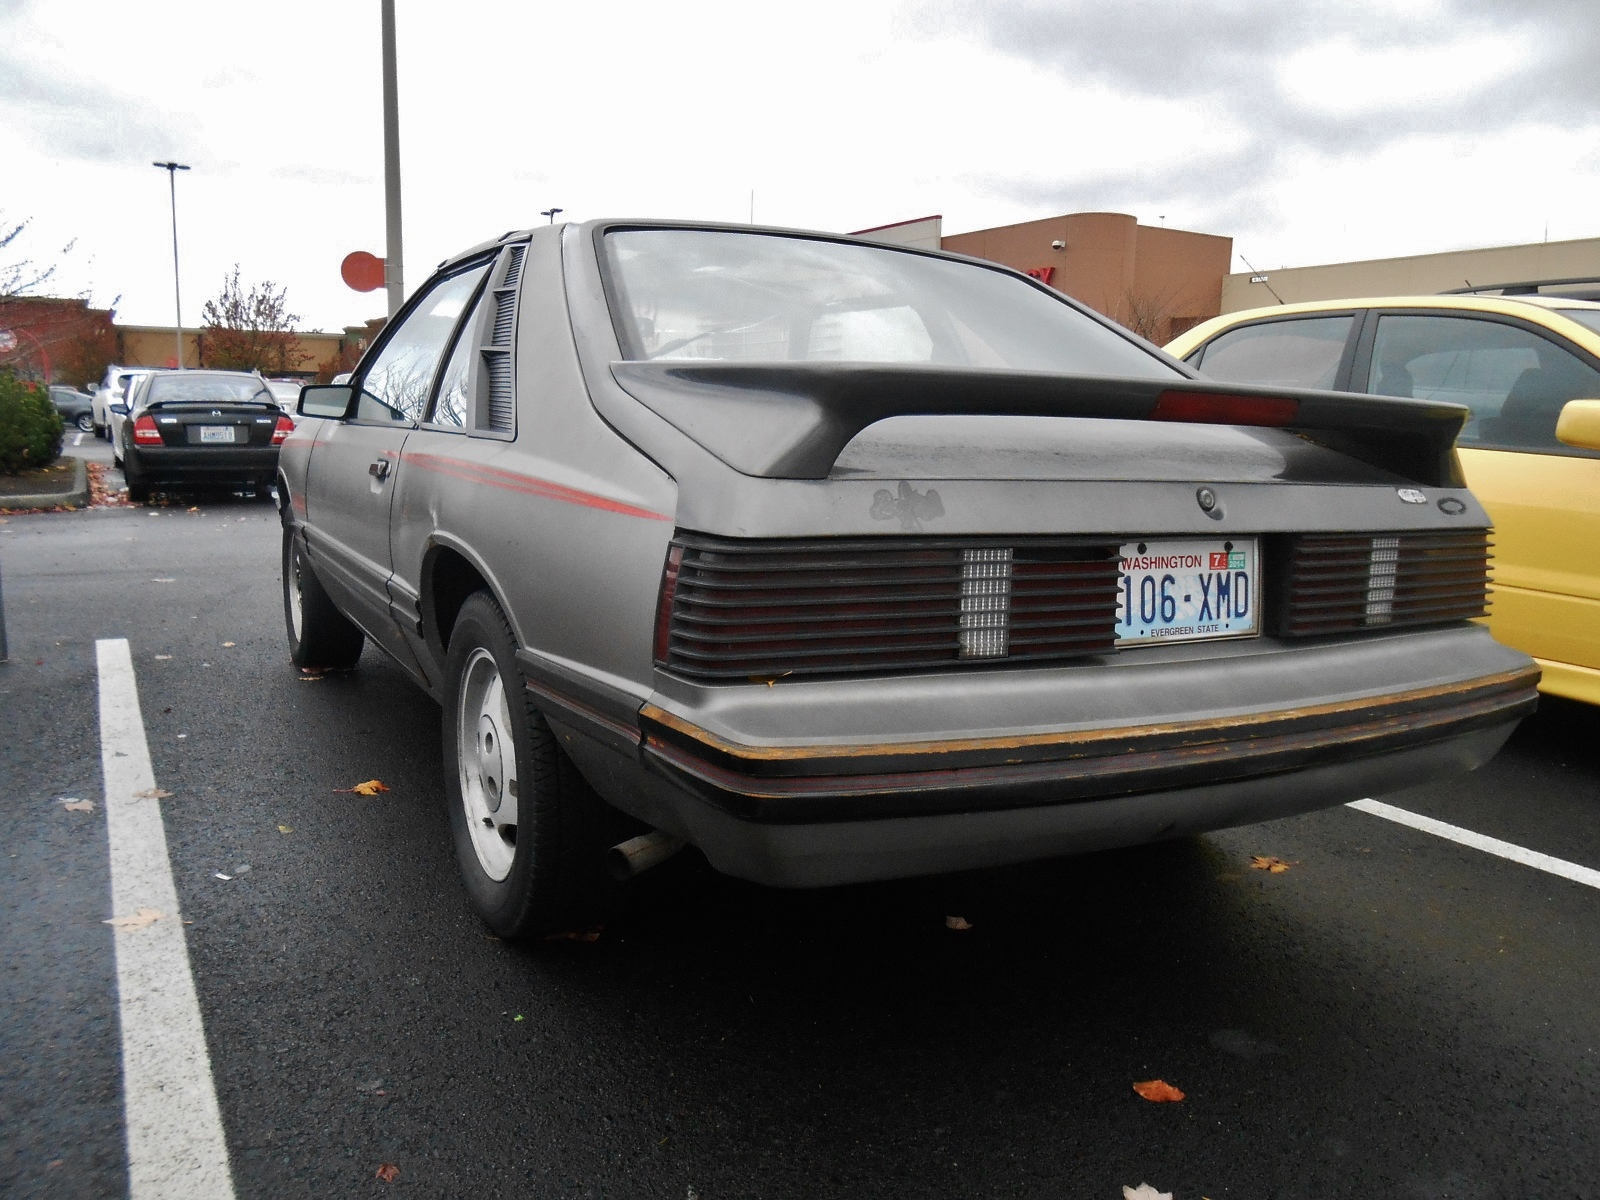 Seattle's Parked Cars: 1980 Mercury Capri RS